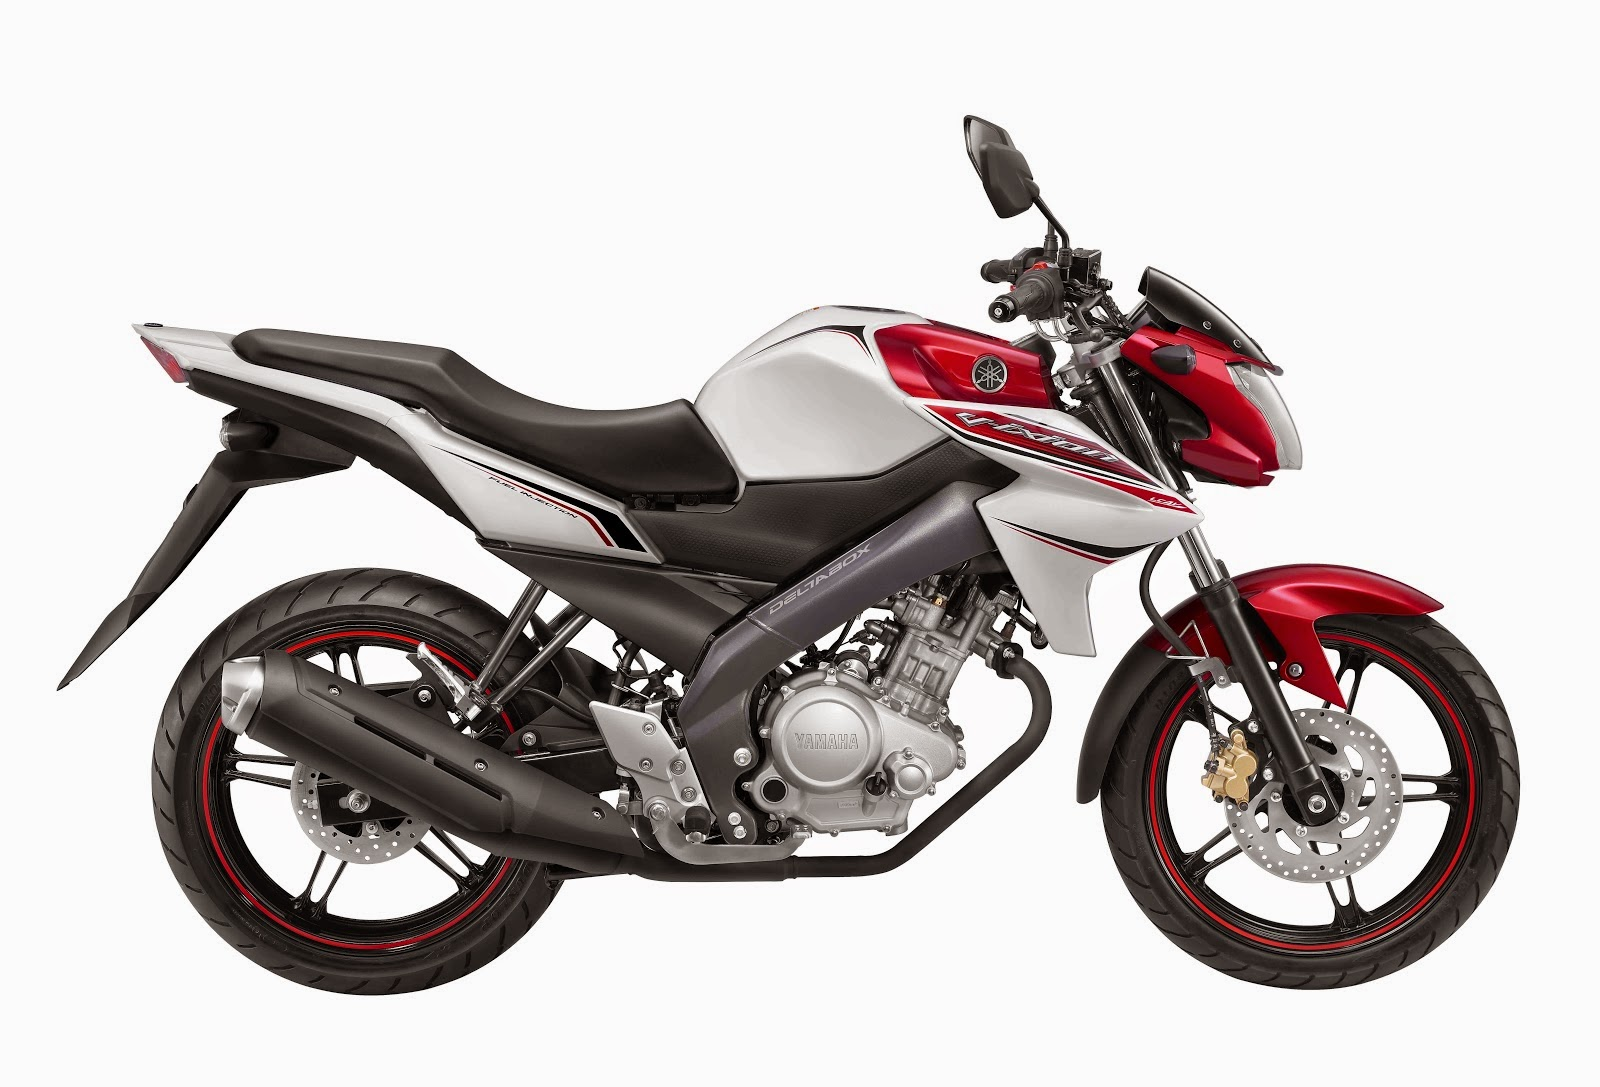 Harga Motor Yamaha Vixion Terbaru Desember 2014